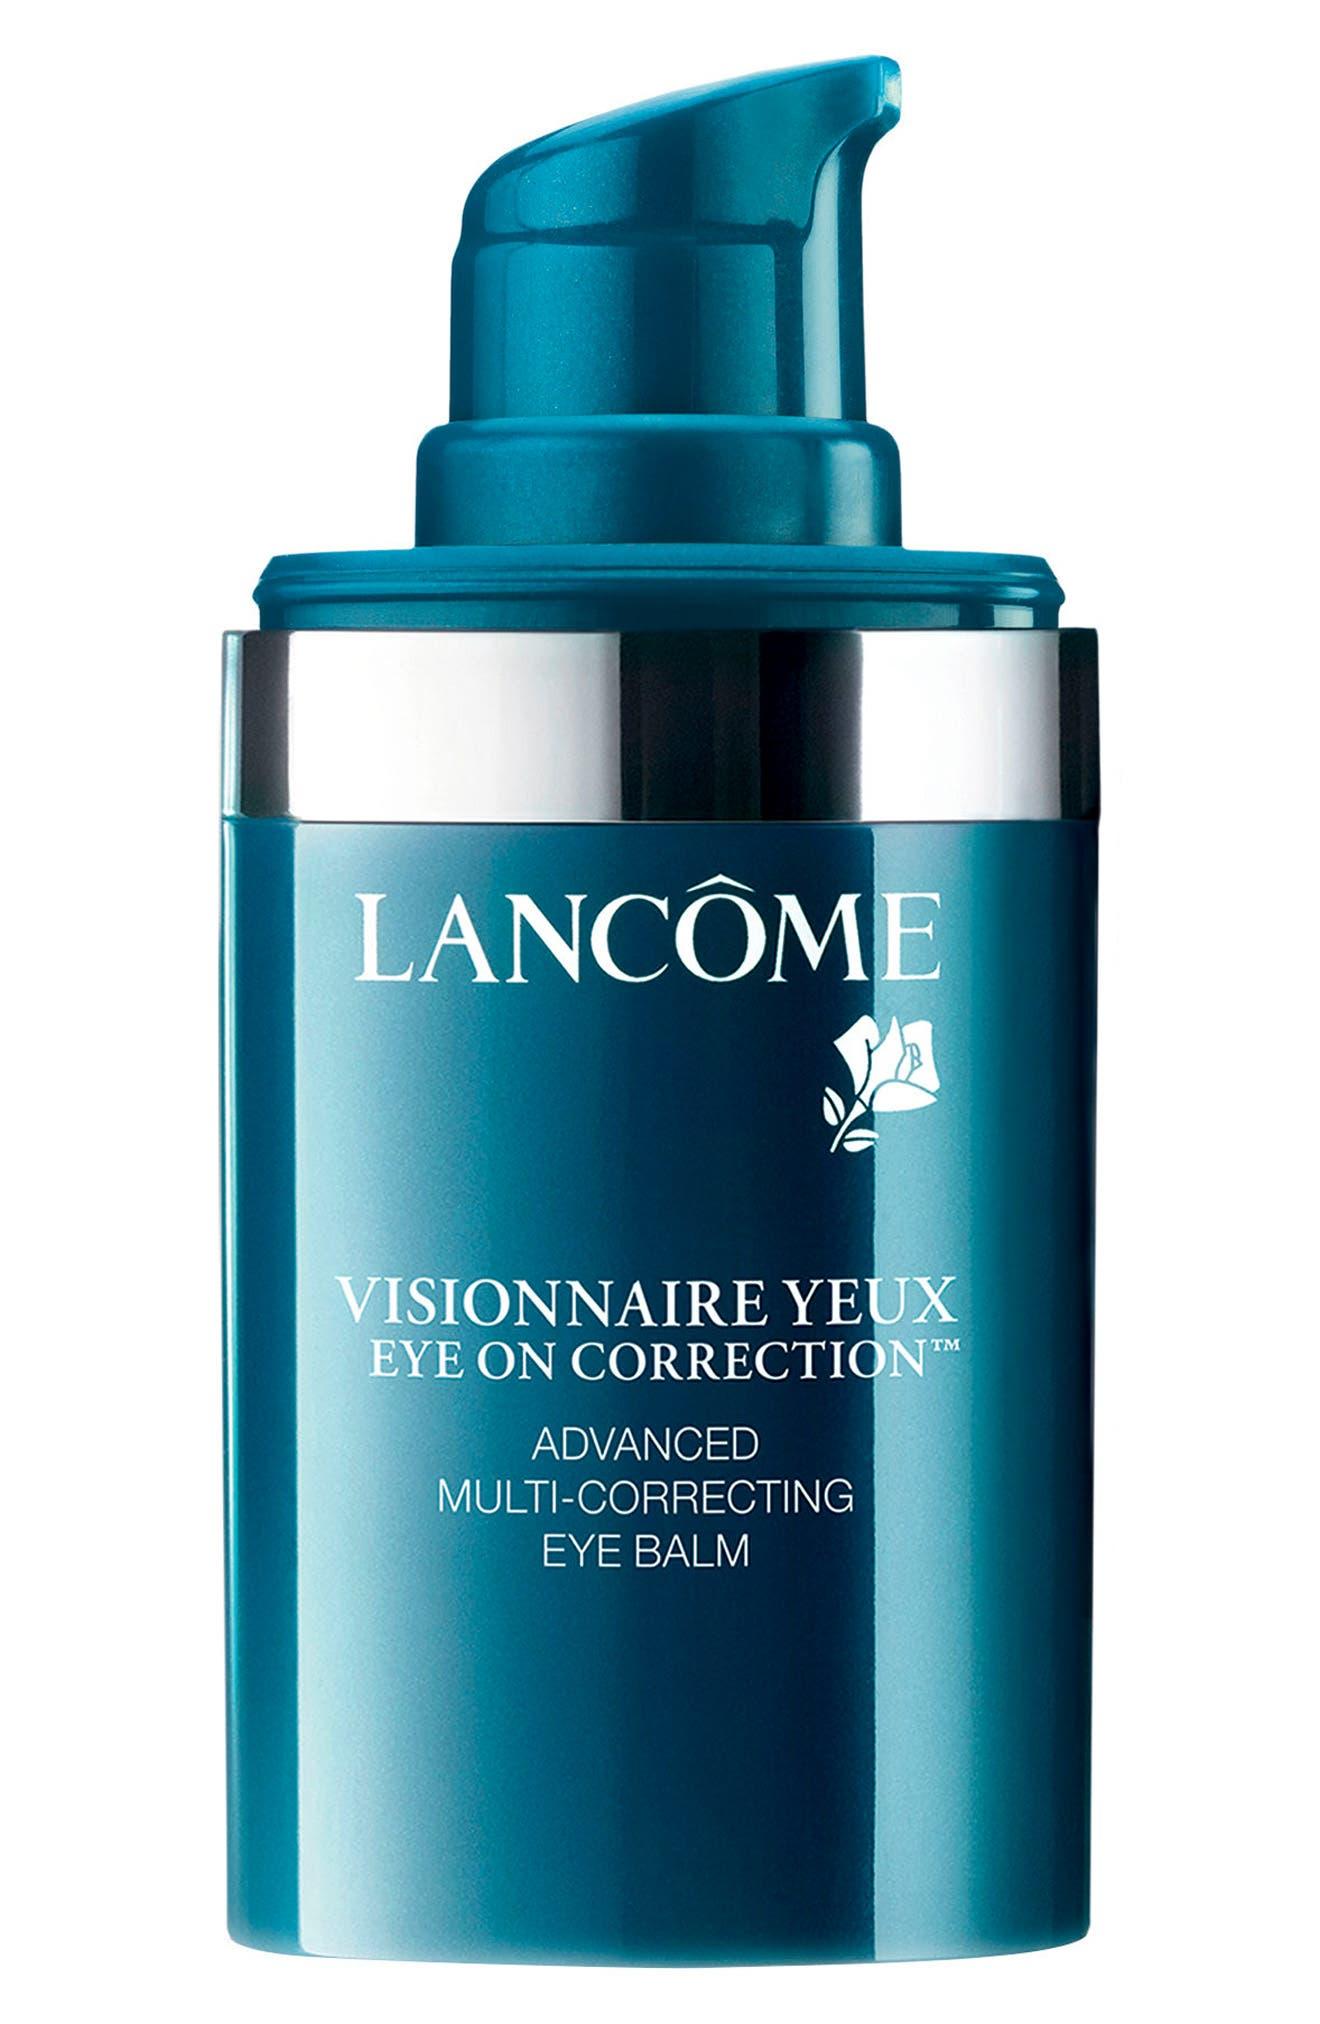 Visionnaire Yeux Eye on Correction<sup>®</sup> Advanced Multi-Correcting Eye Balm,                         Main,                         color, NO COLOR